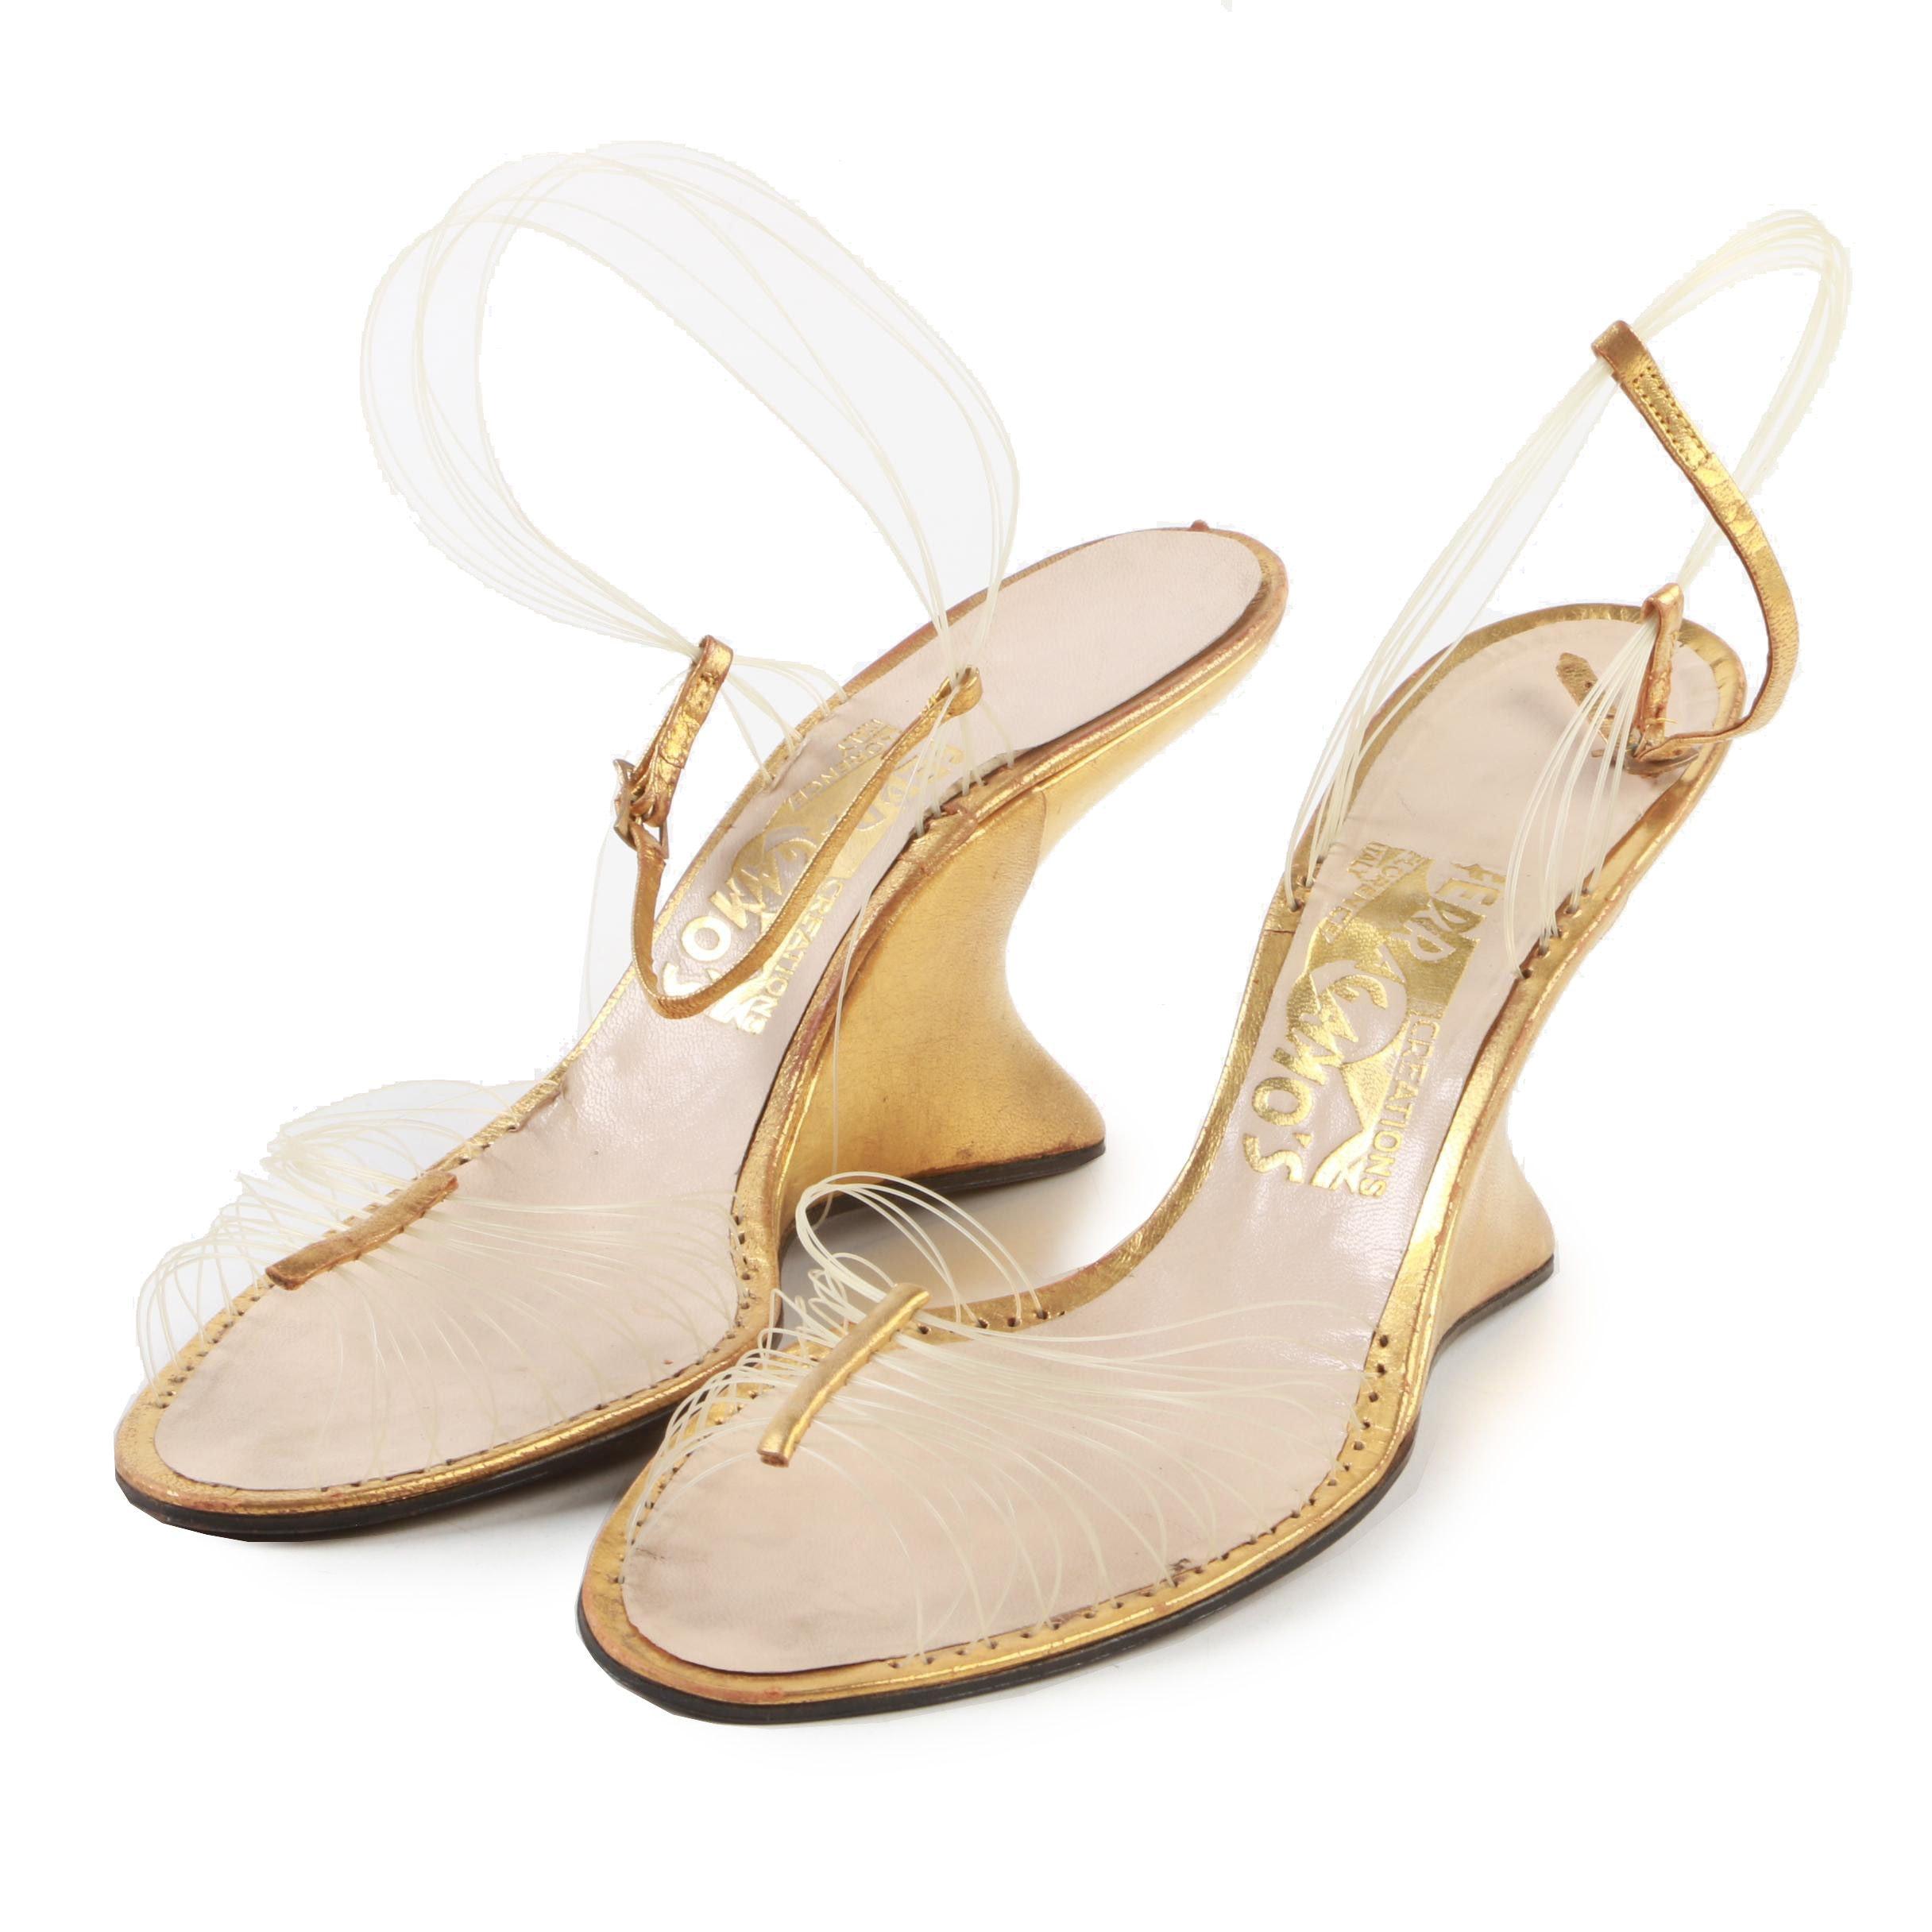 Salvatore Ferragamo Creations Patented Invisible Wedge Sandals, Late 1940s